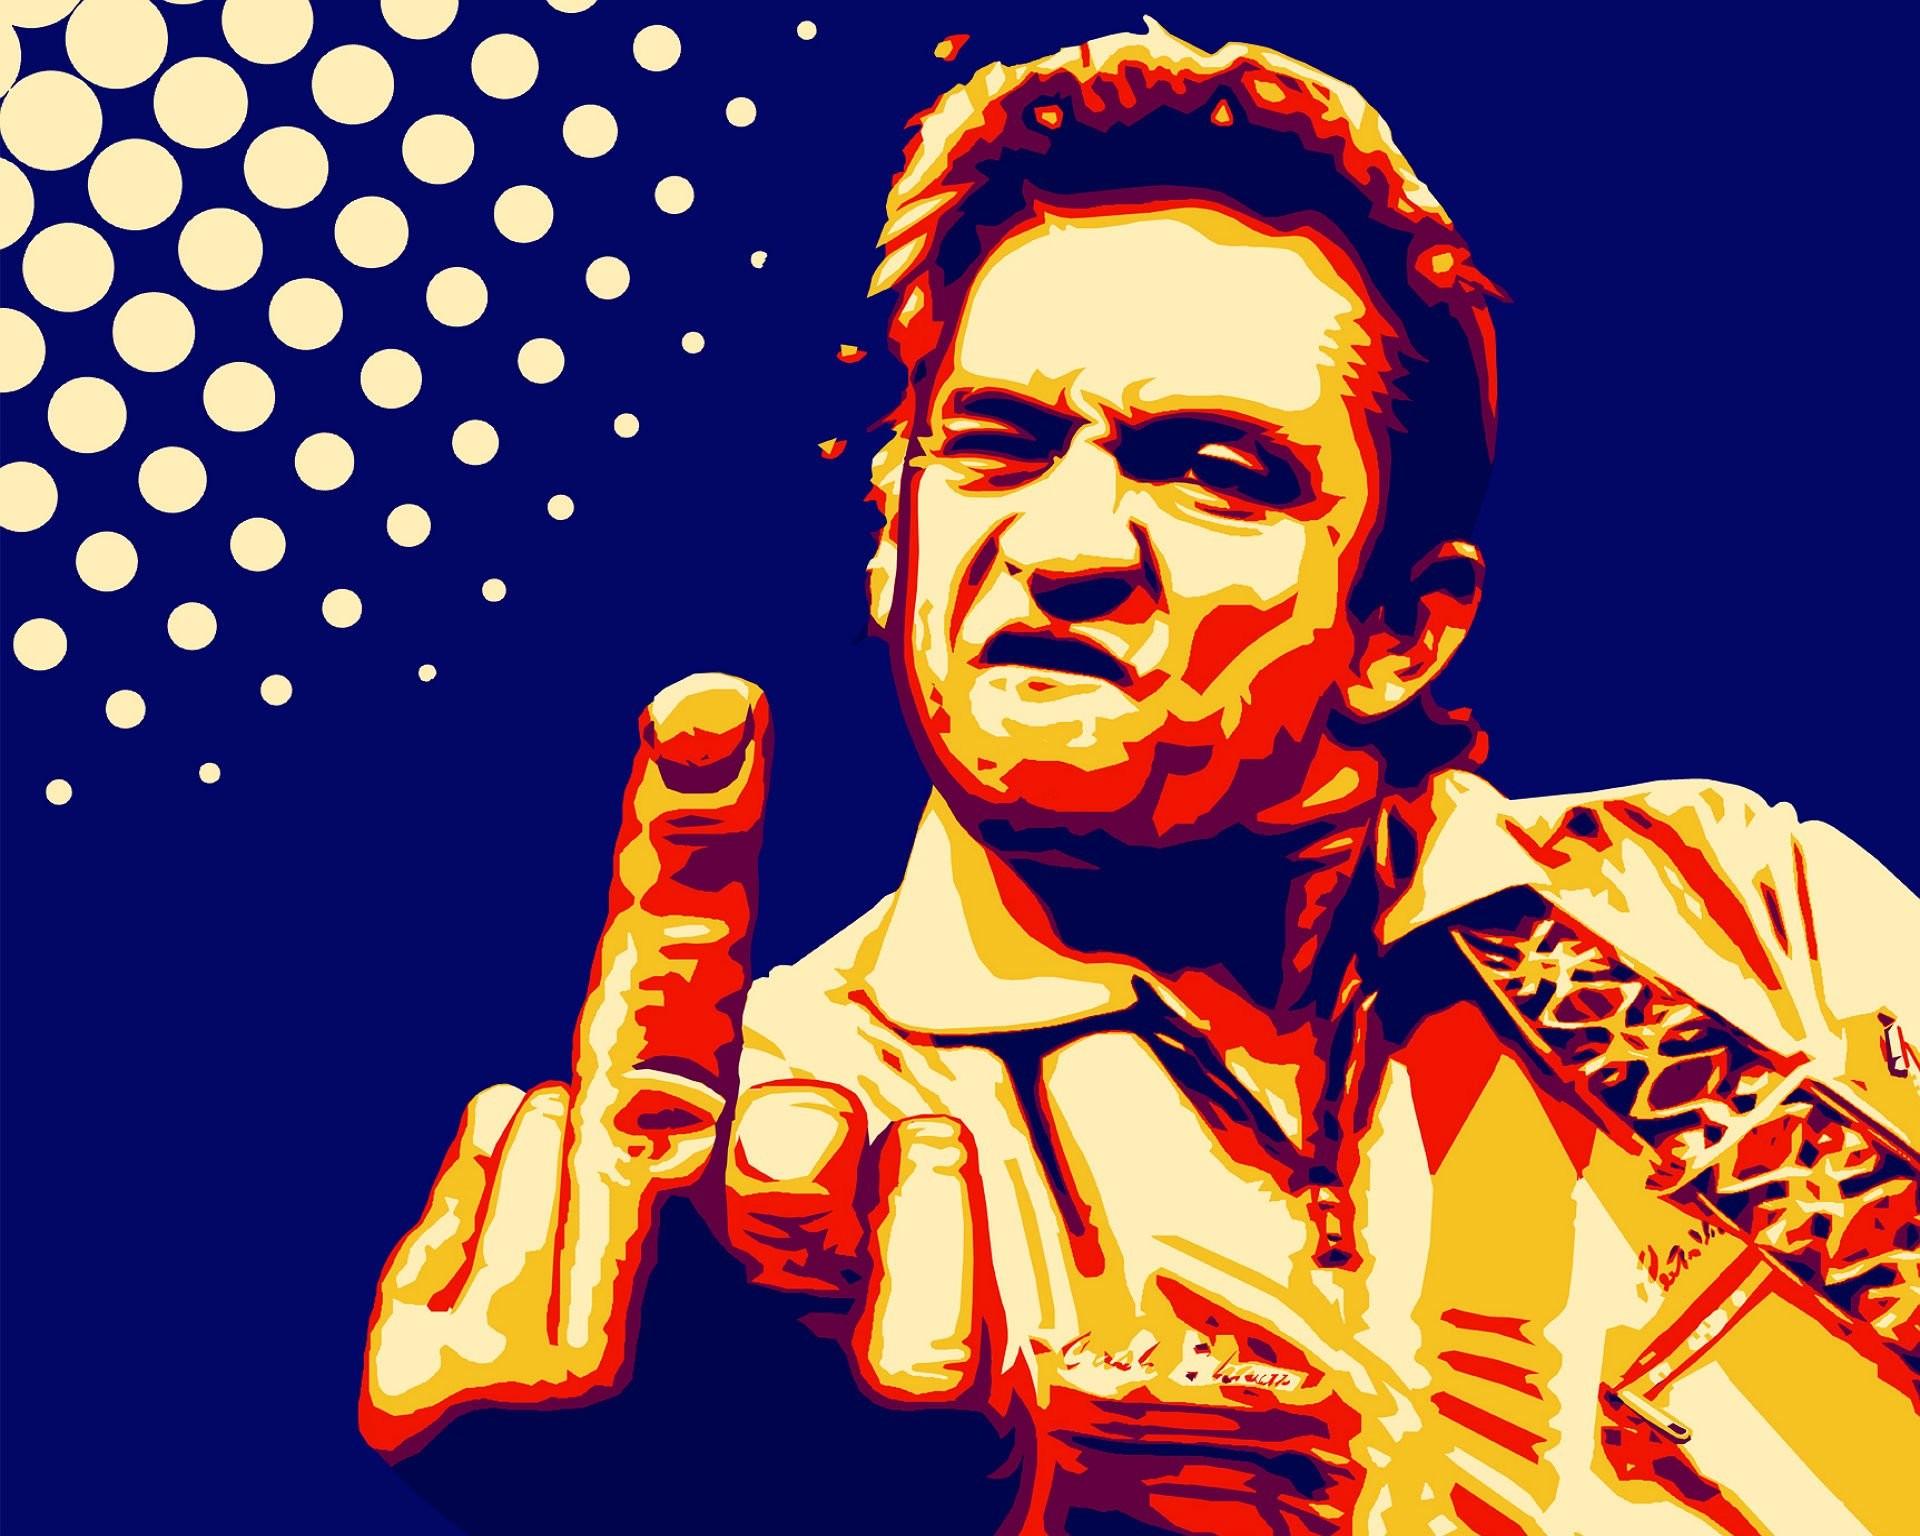 JOHNNY CASH countrywestern country western blues singer 1jcash actor folk  rockabilly gospel rock roll finger sadic wallpaper | | 635236 |  …